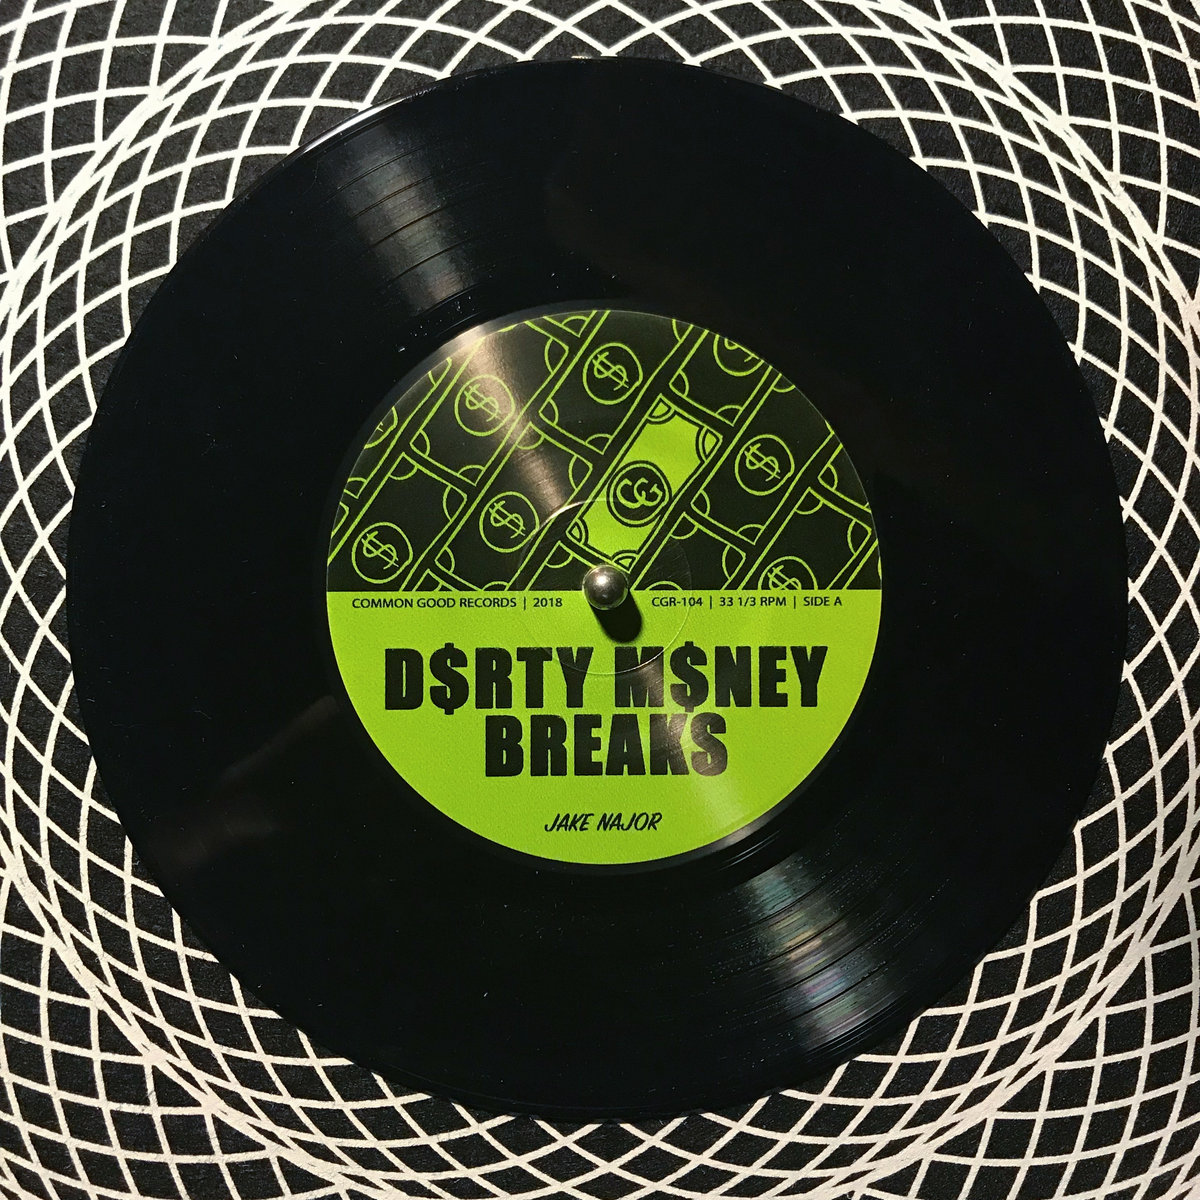 dirty money breaks vinyl producer drum kit common good records